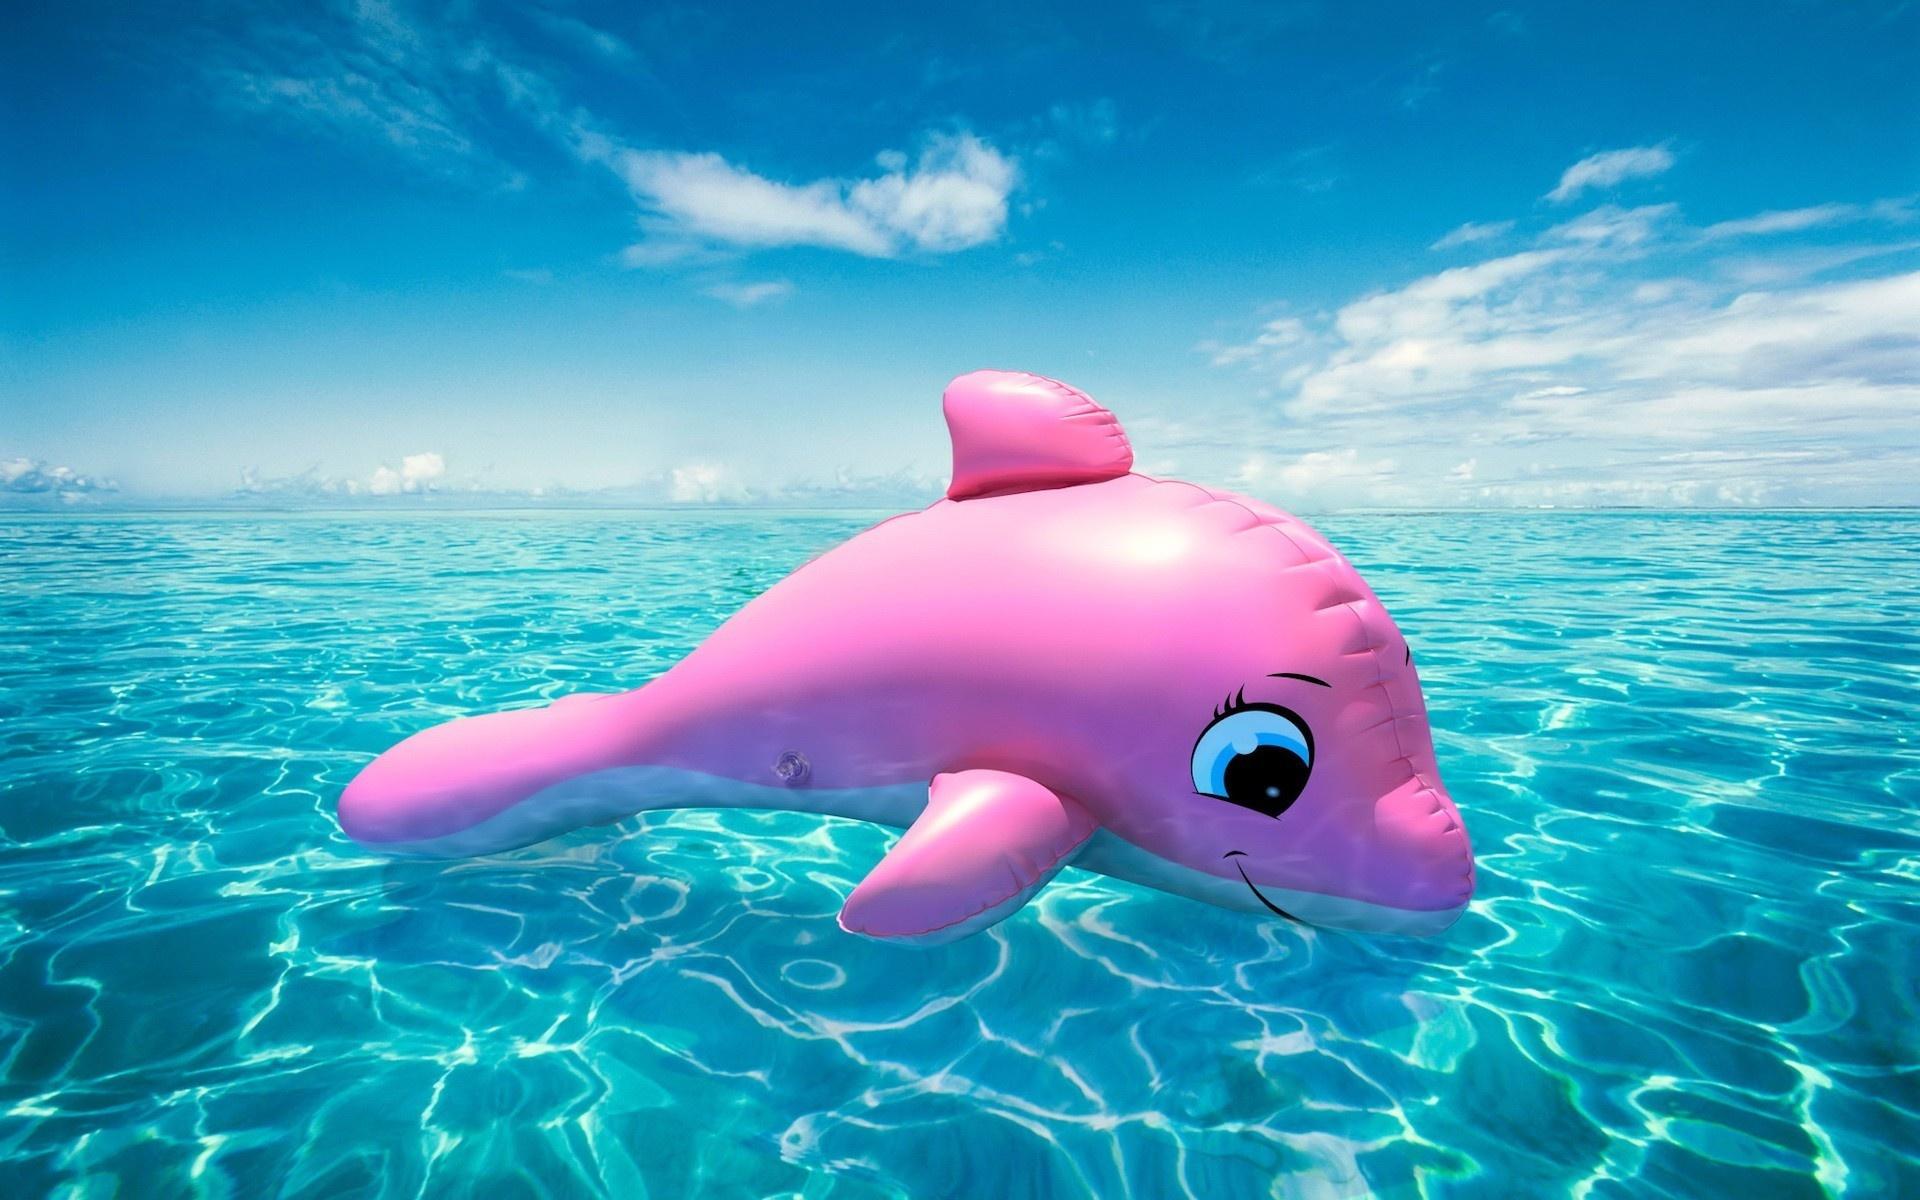 Pink Dolphin Wallpaper - Pink Dolphin Wallpaper